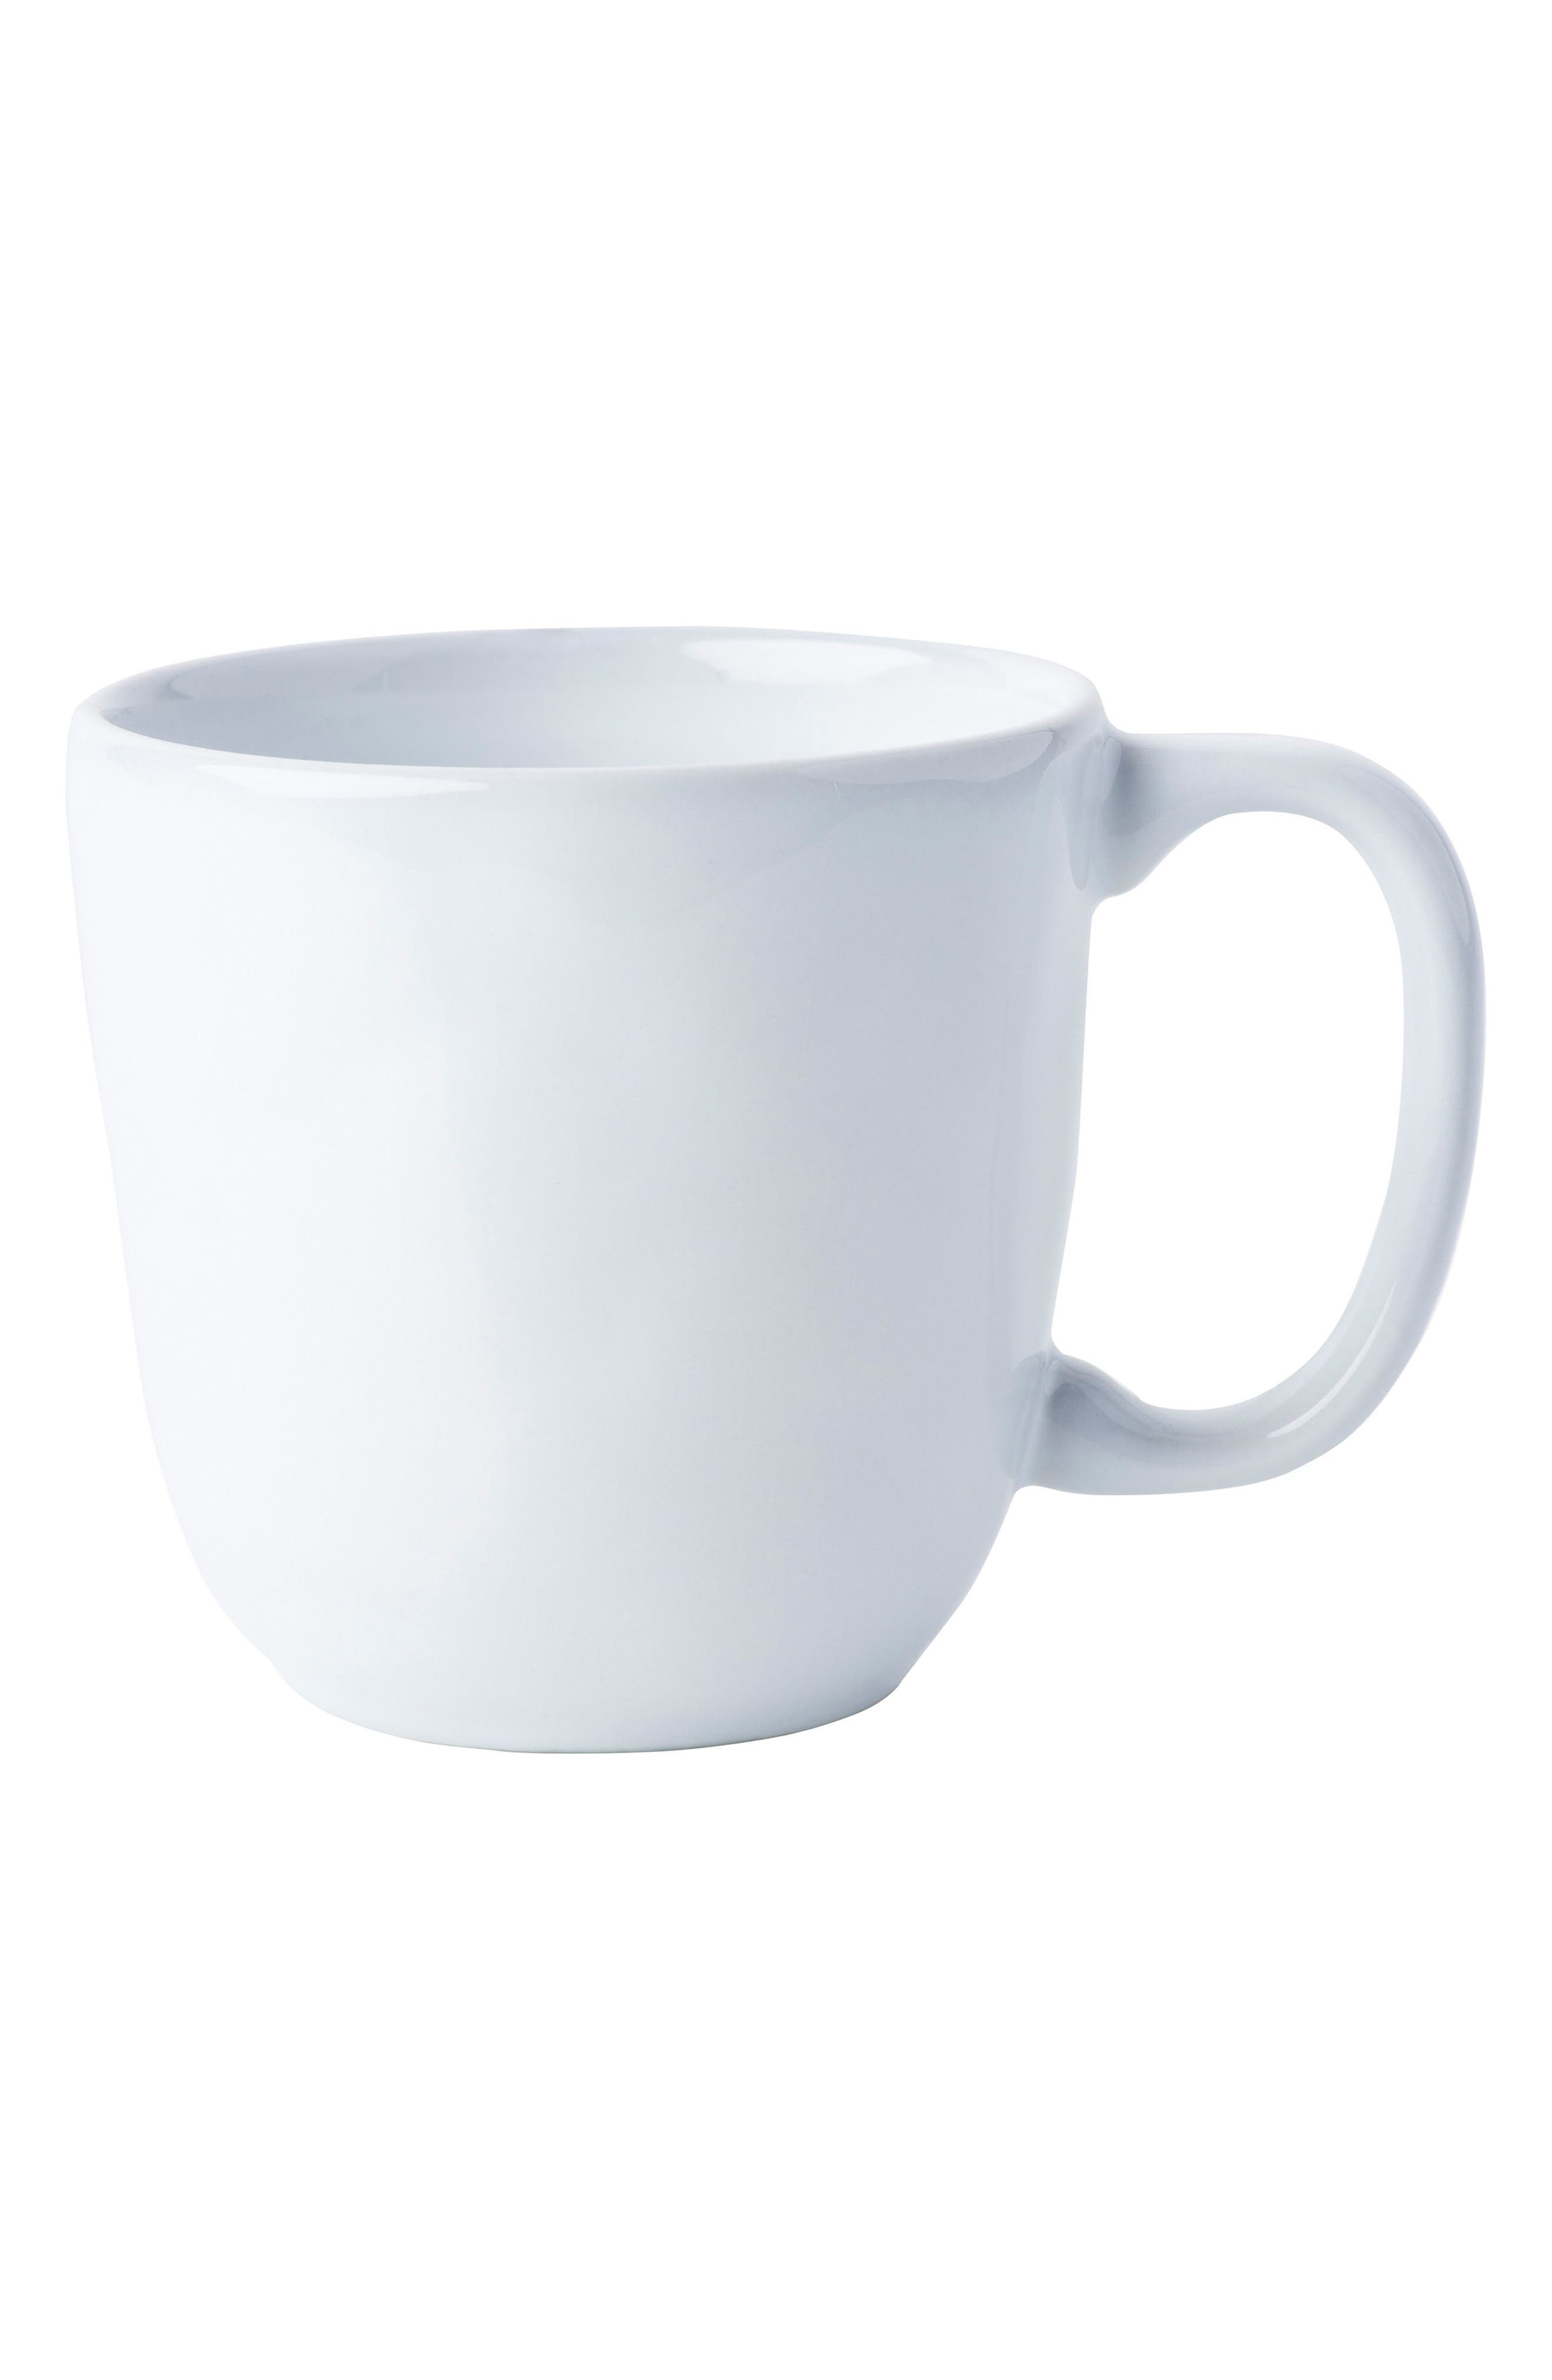 Quotidien White Truffle Ceramic Mug,                         Main,                         color, White Truffle